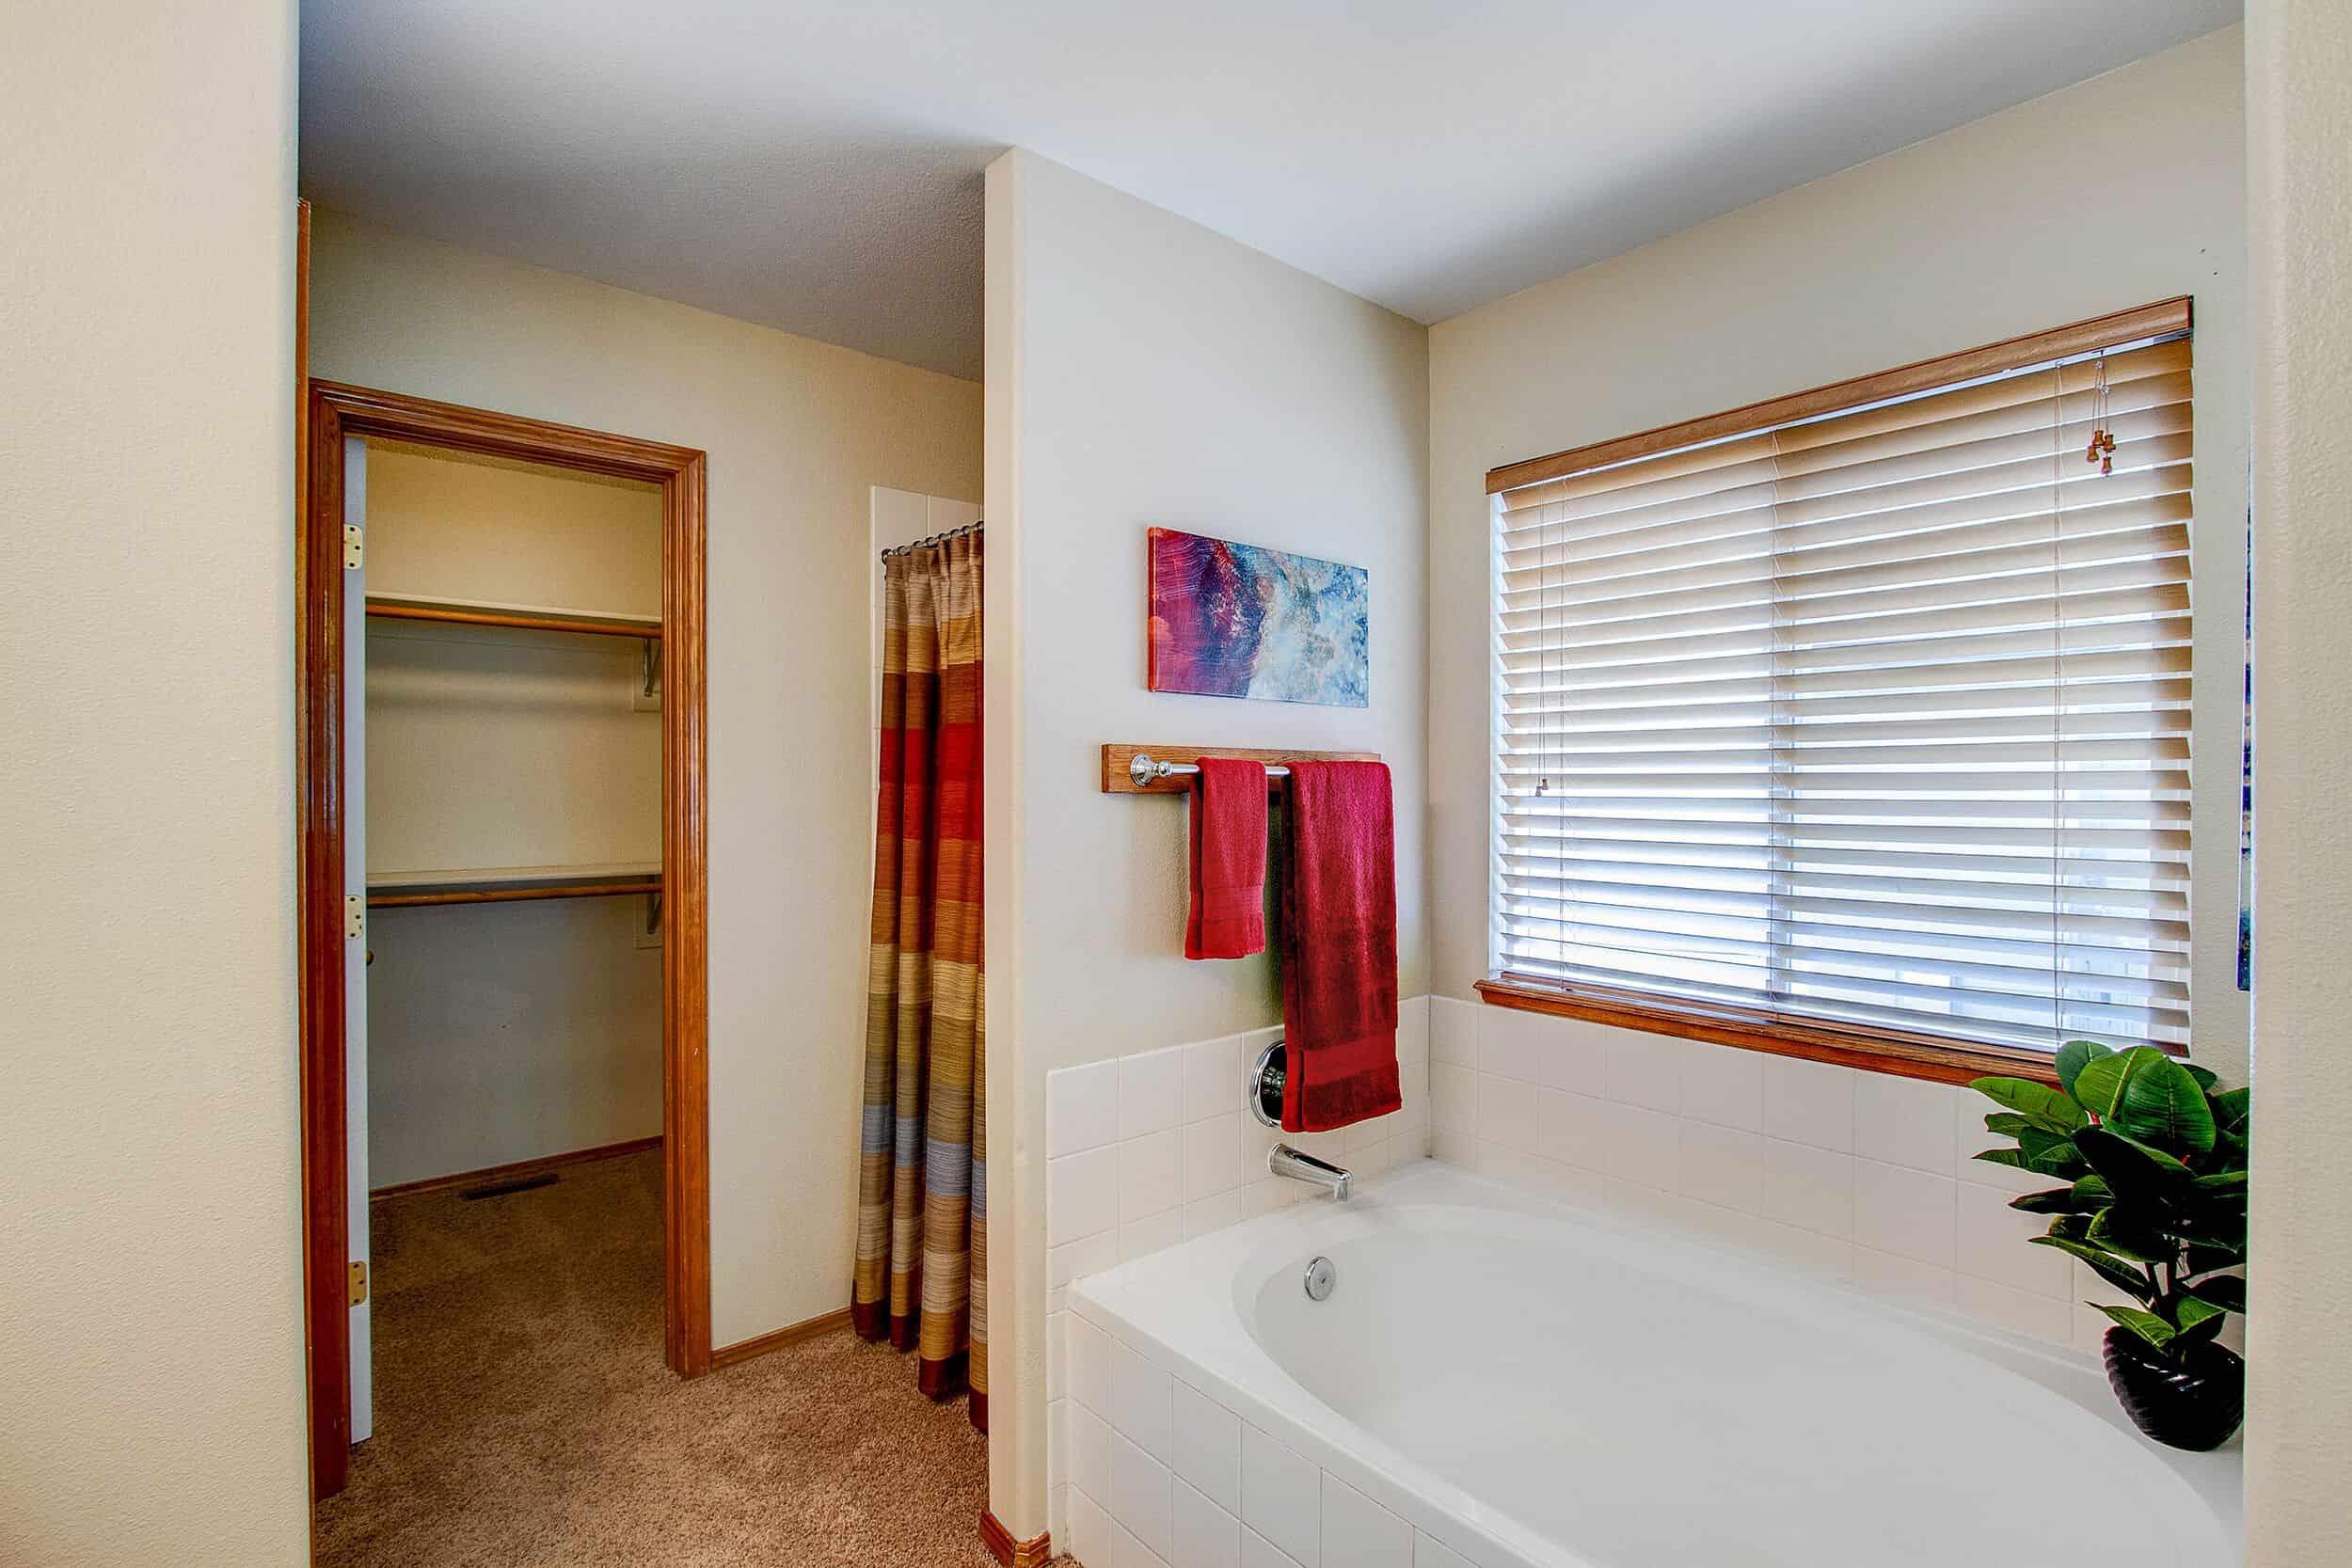 5pc Master Bathroom with Soaking Tub